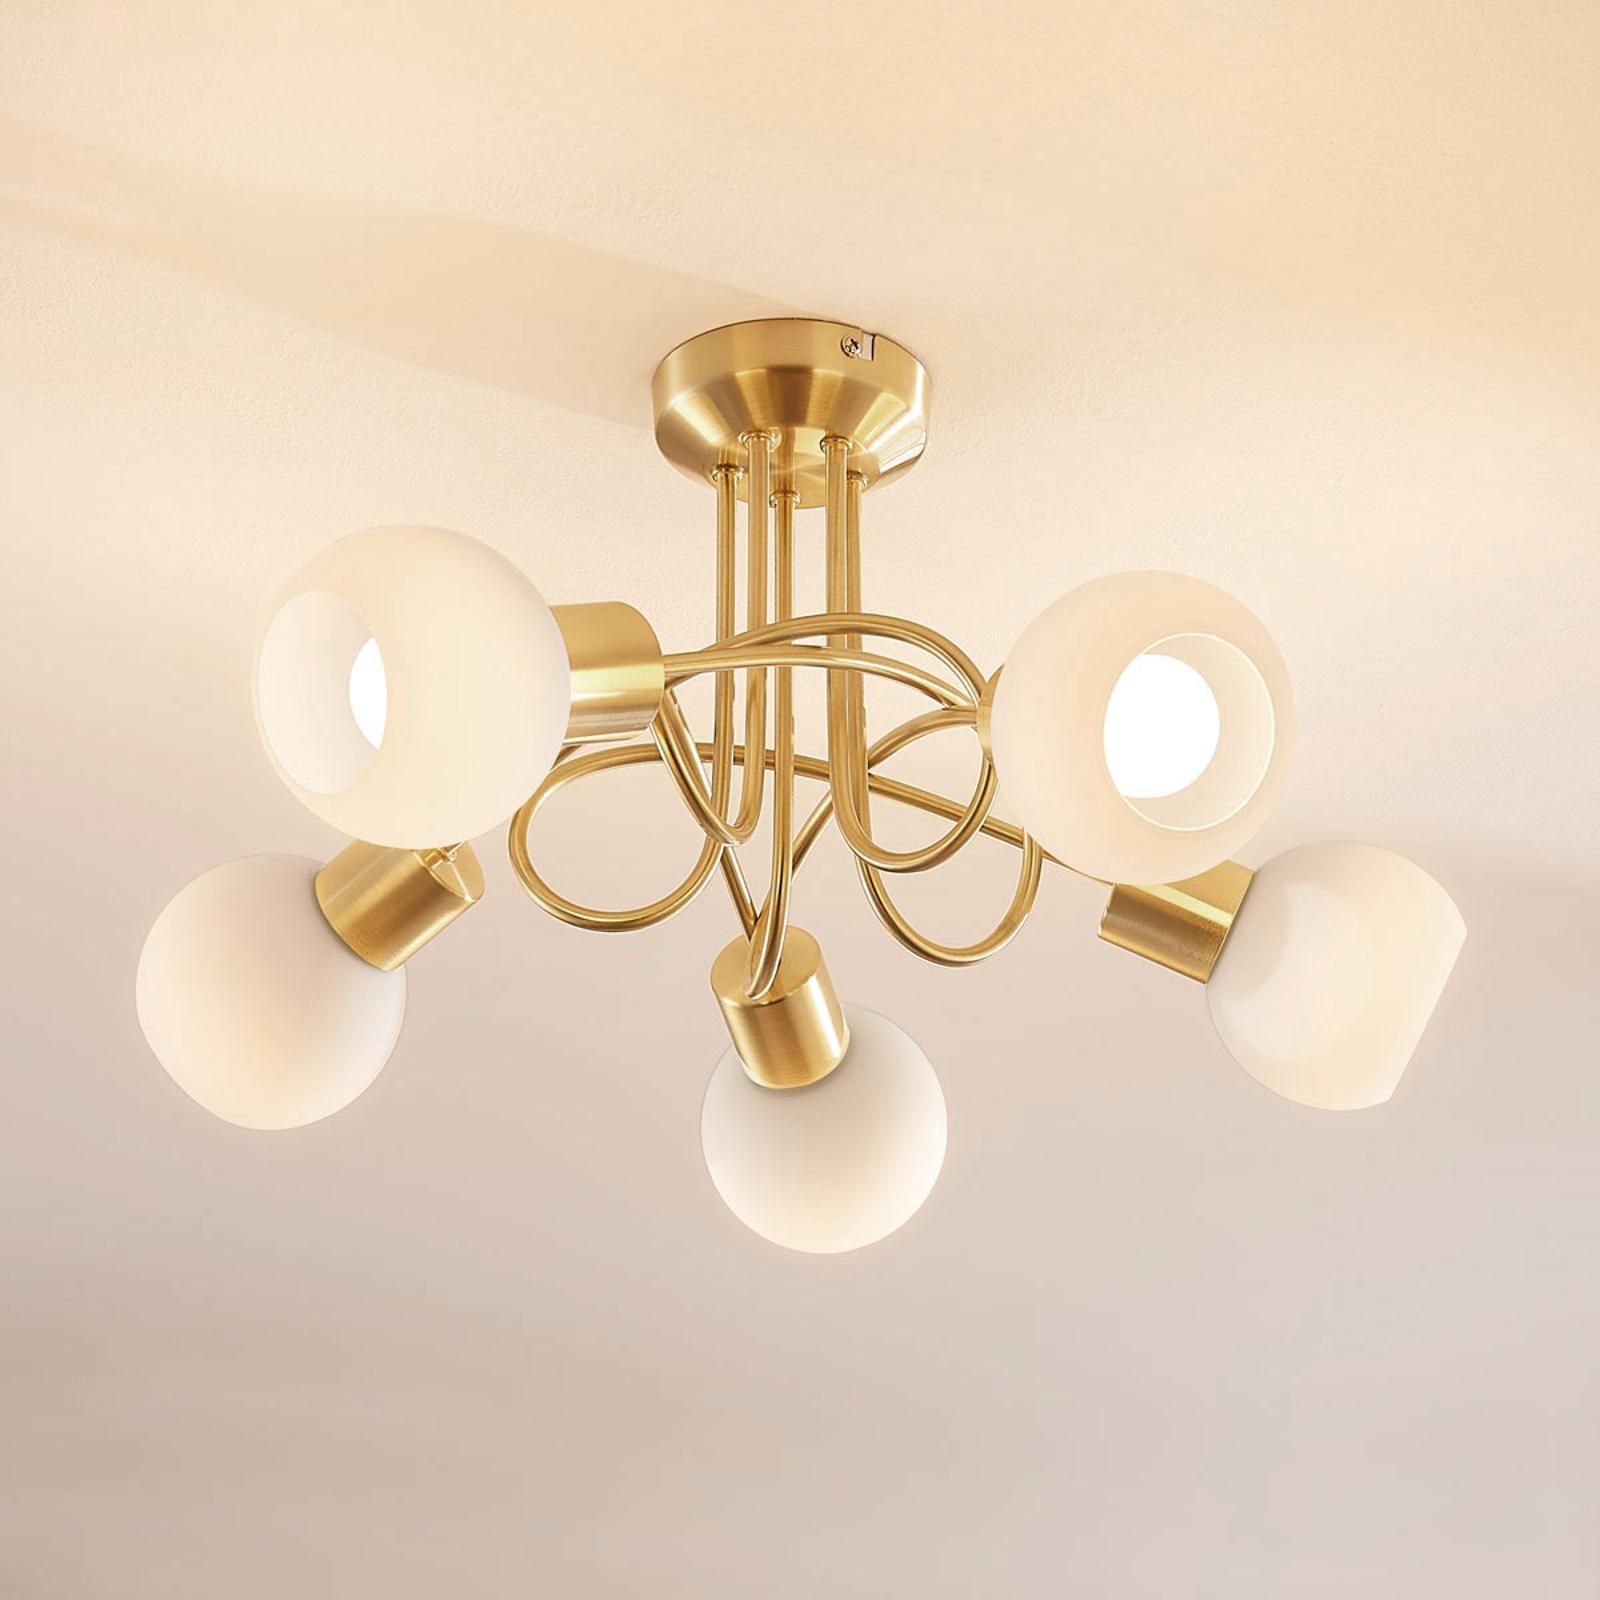 LED-Deckenlampe Elaina, 5-fl, messing, mit Abstand